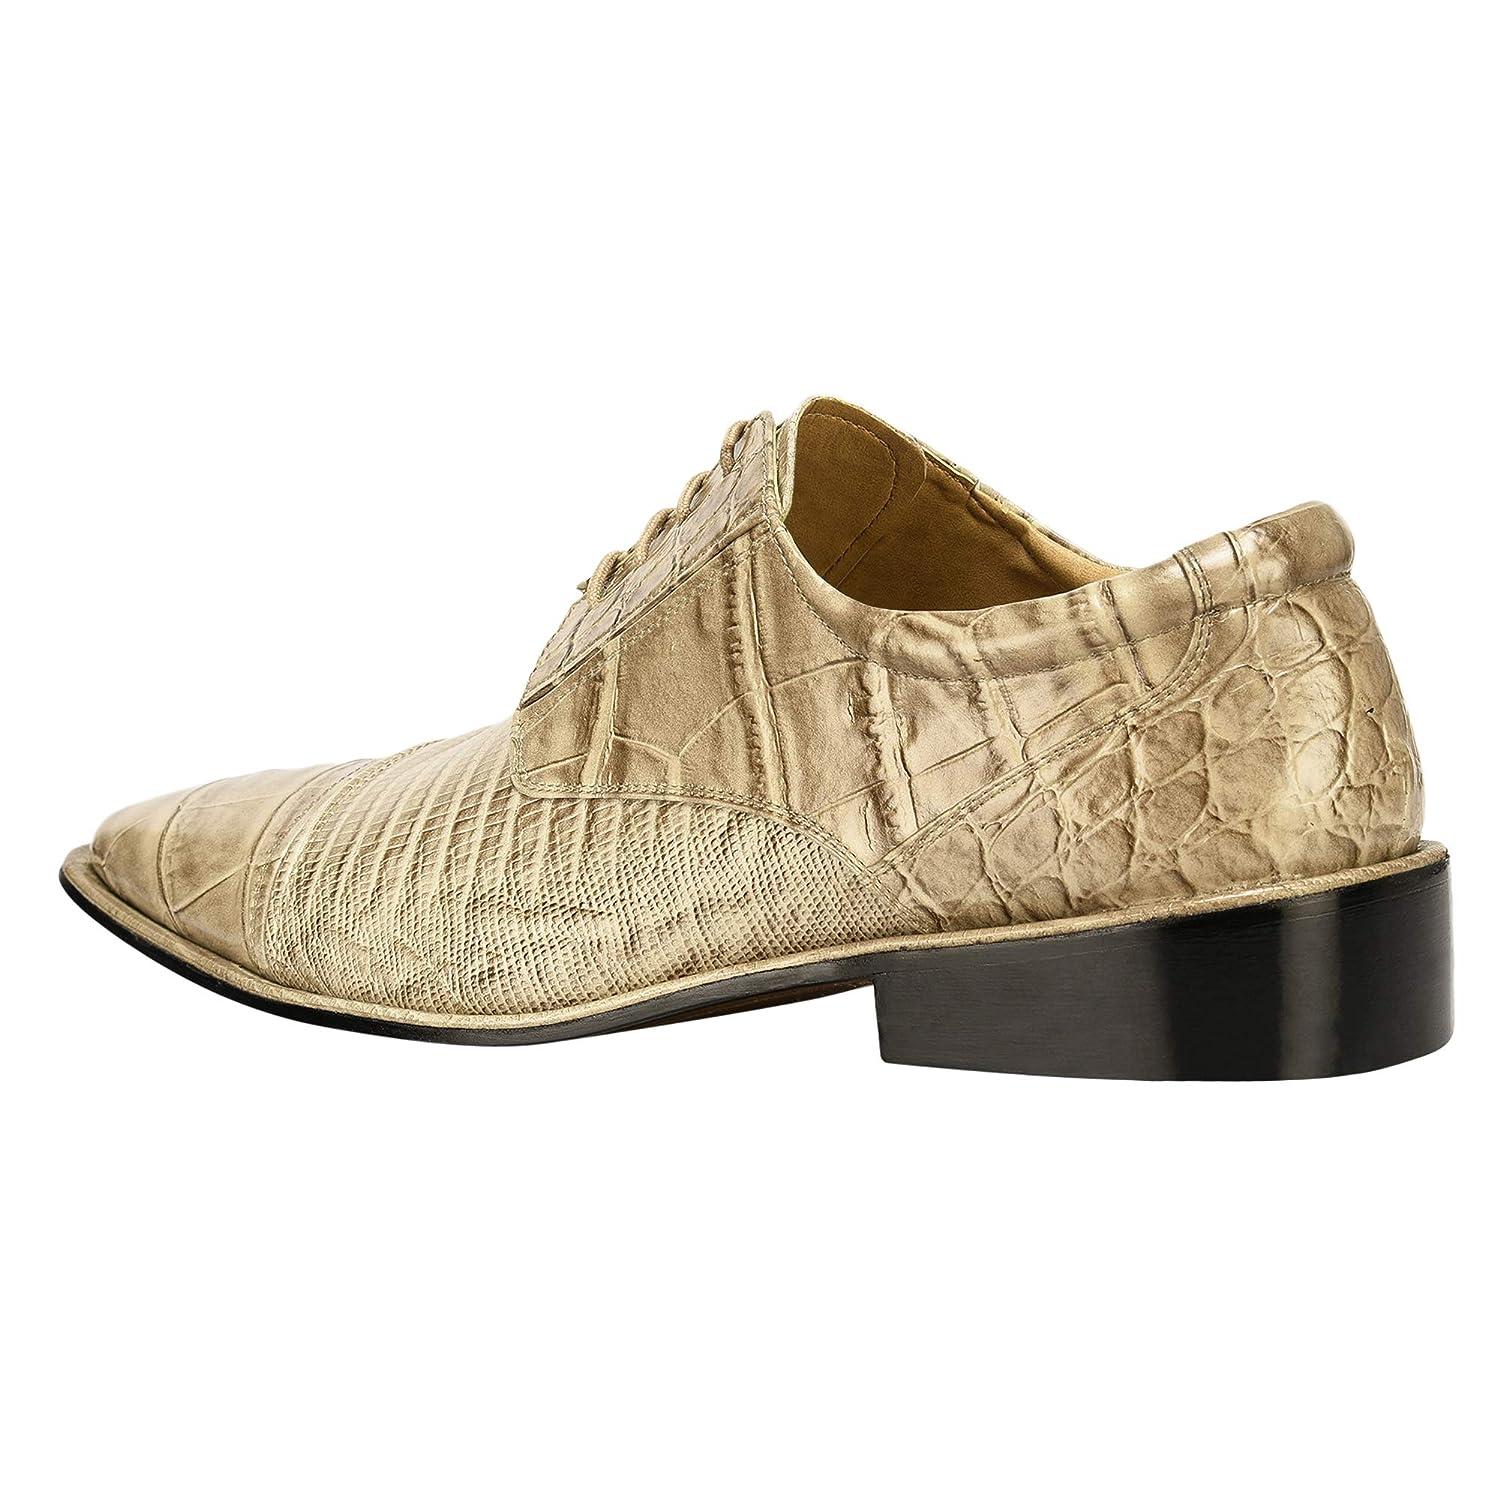 exotic mens dress shoes